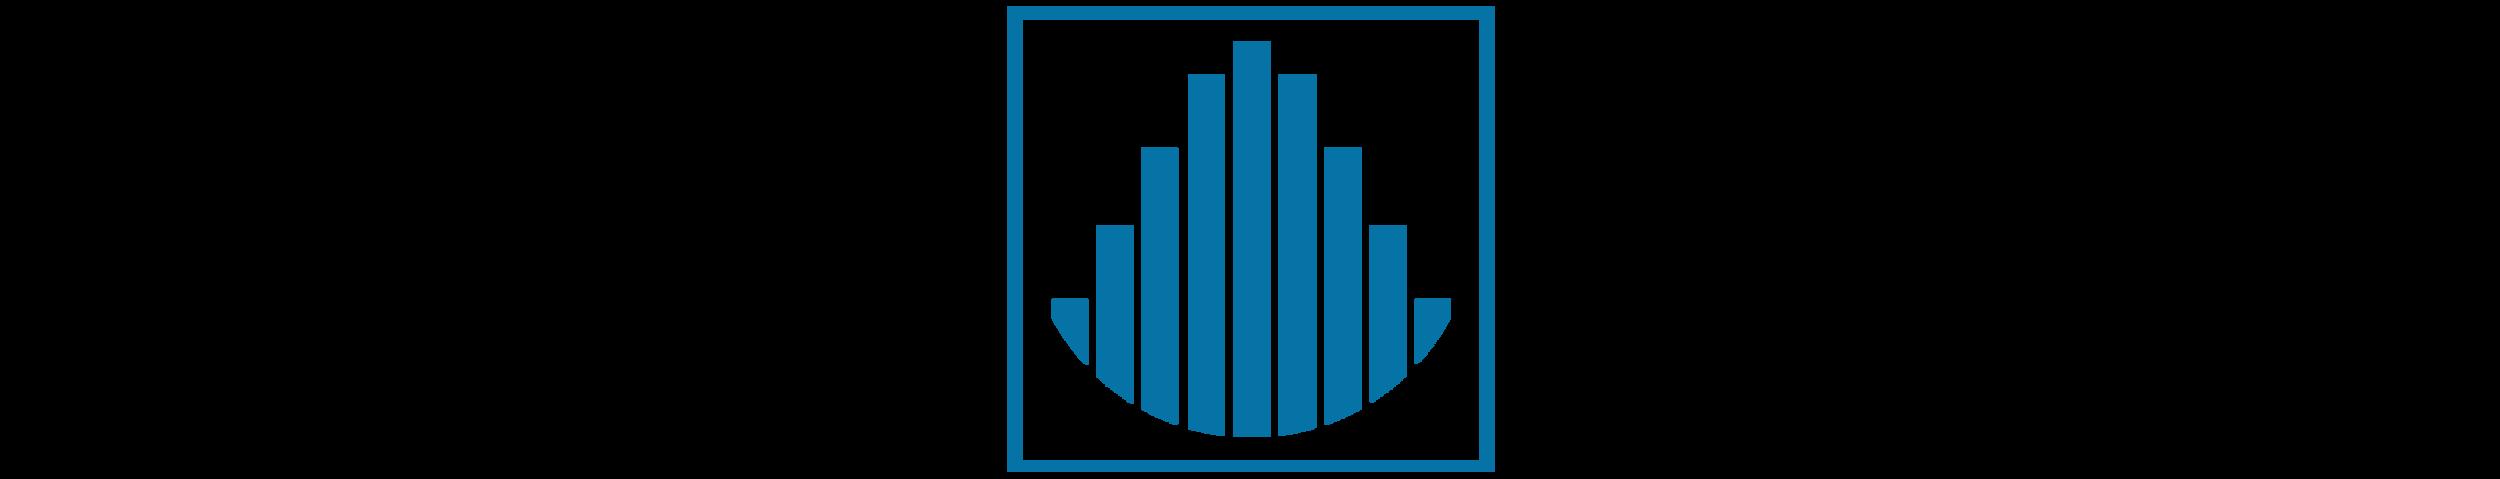 HCA_App_Logo_2.png